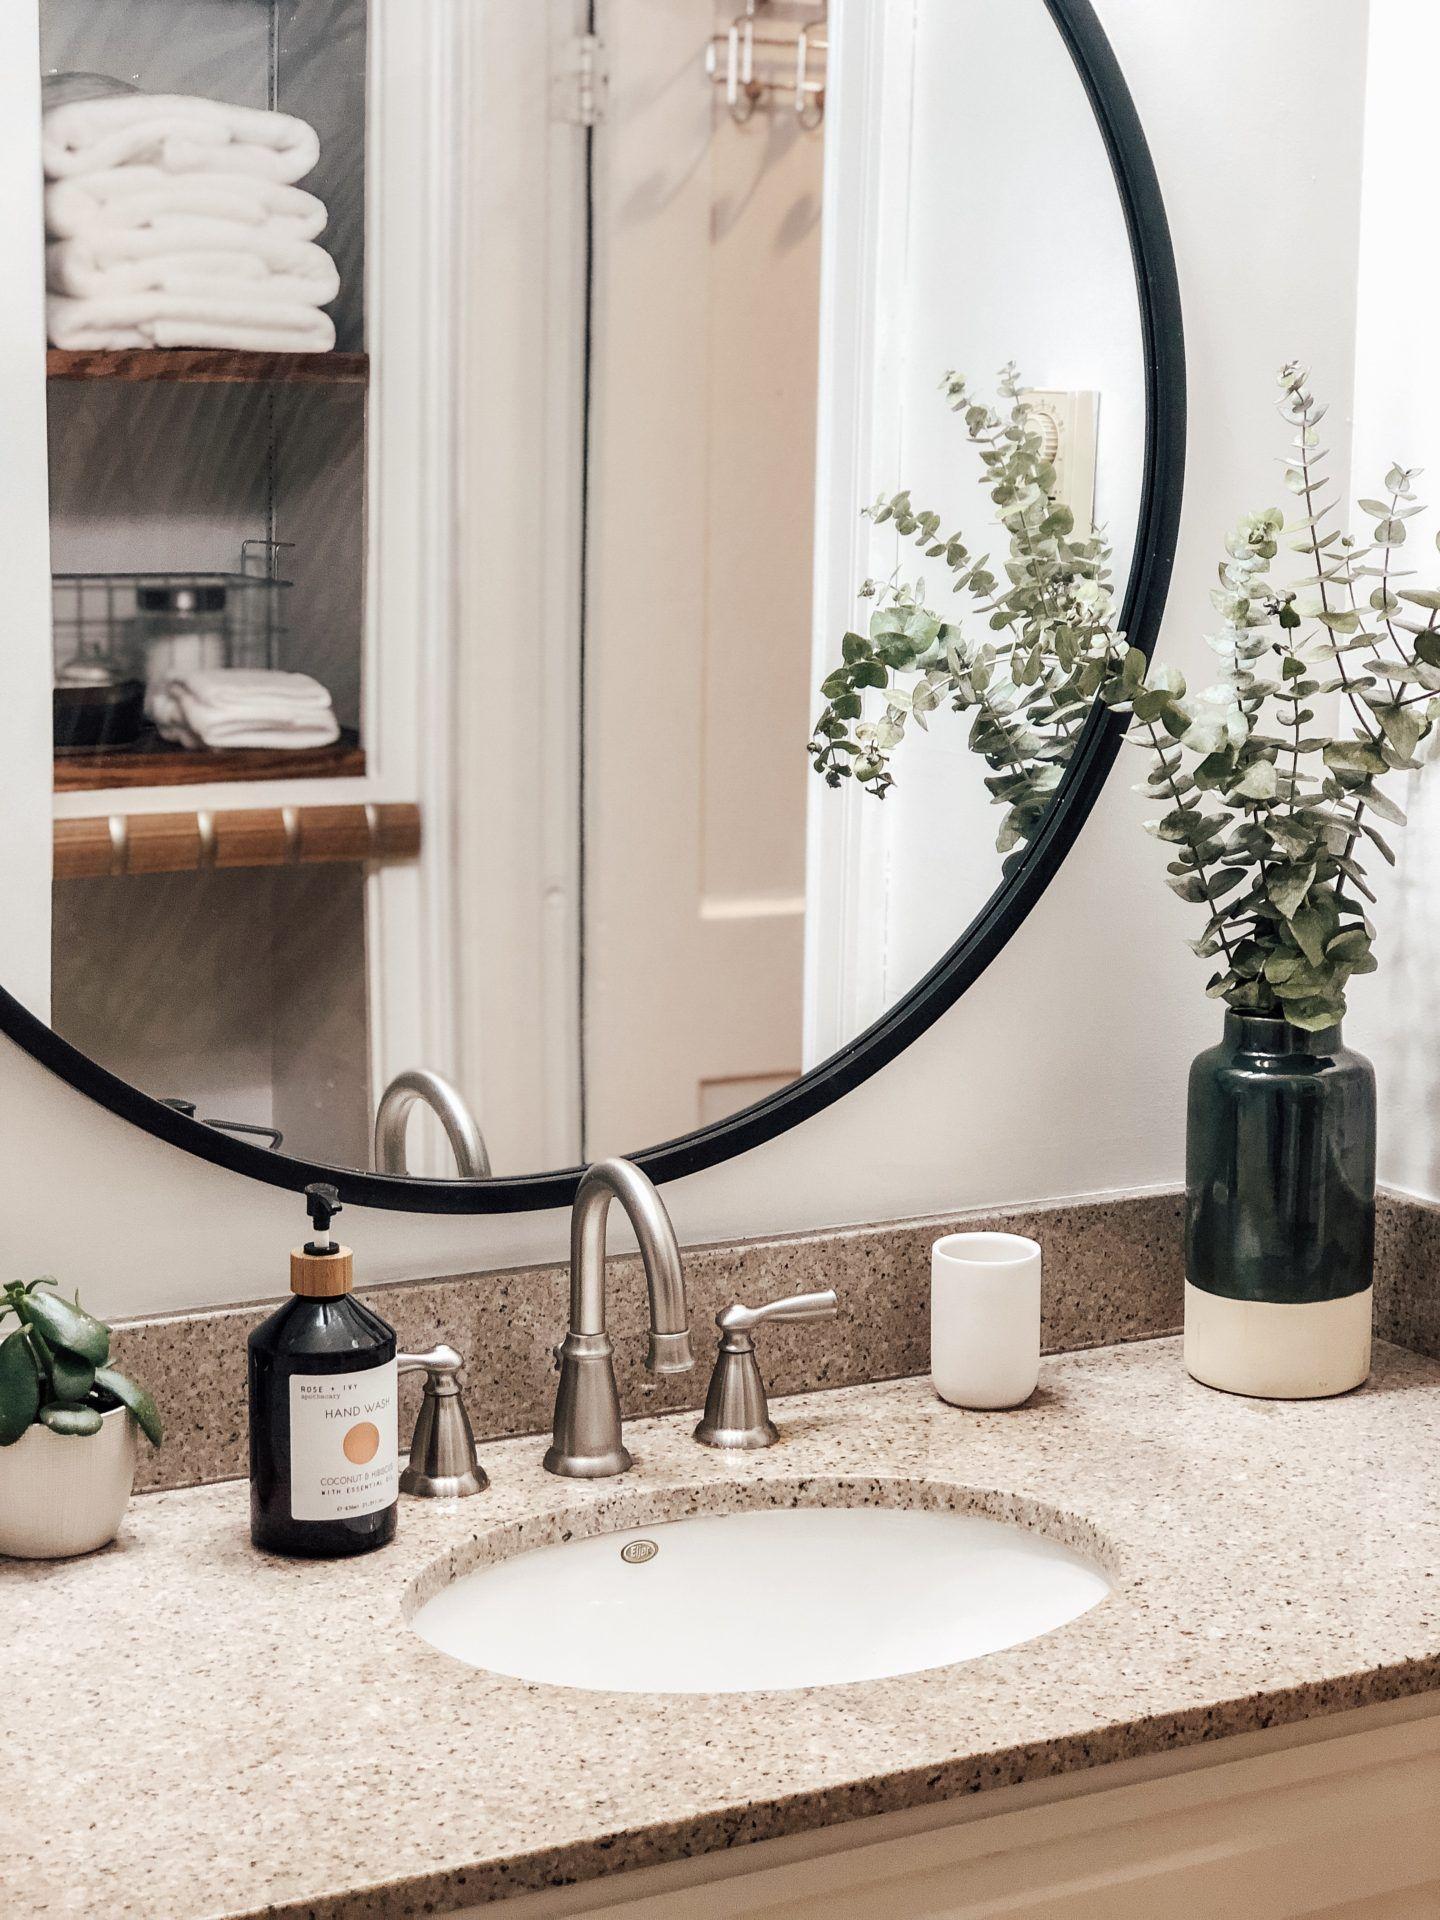 Diy Bathroom Makeover Where Vintage Meets Modern - Top Blogs